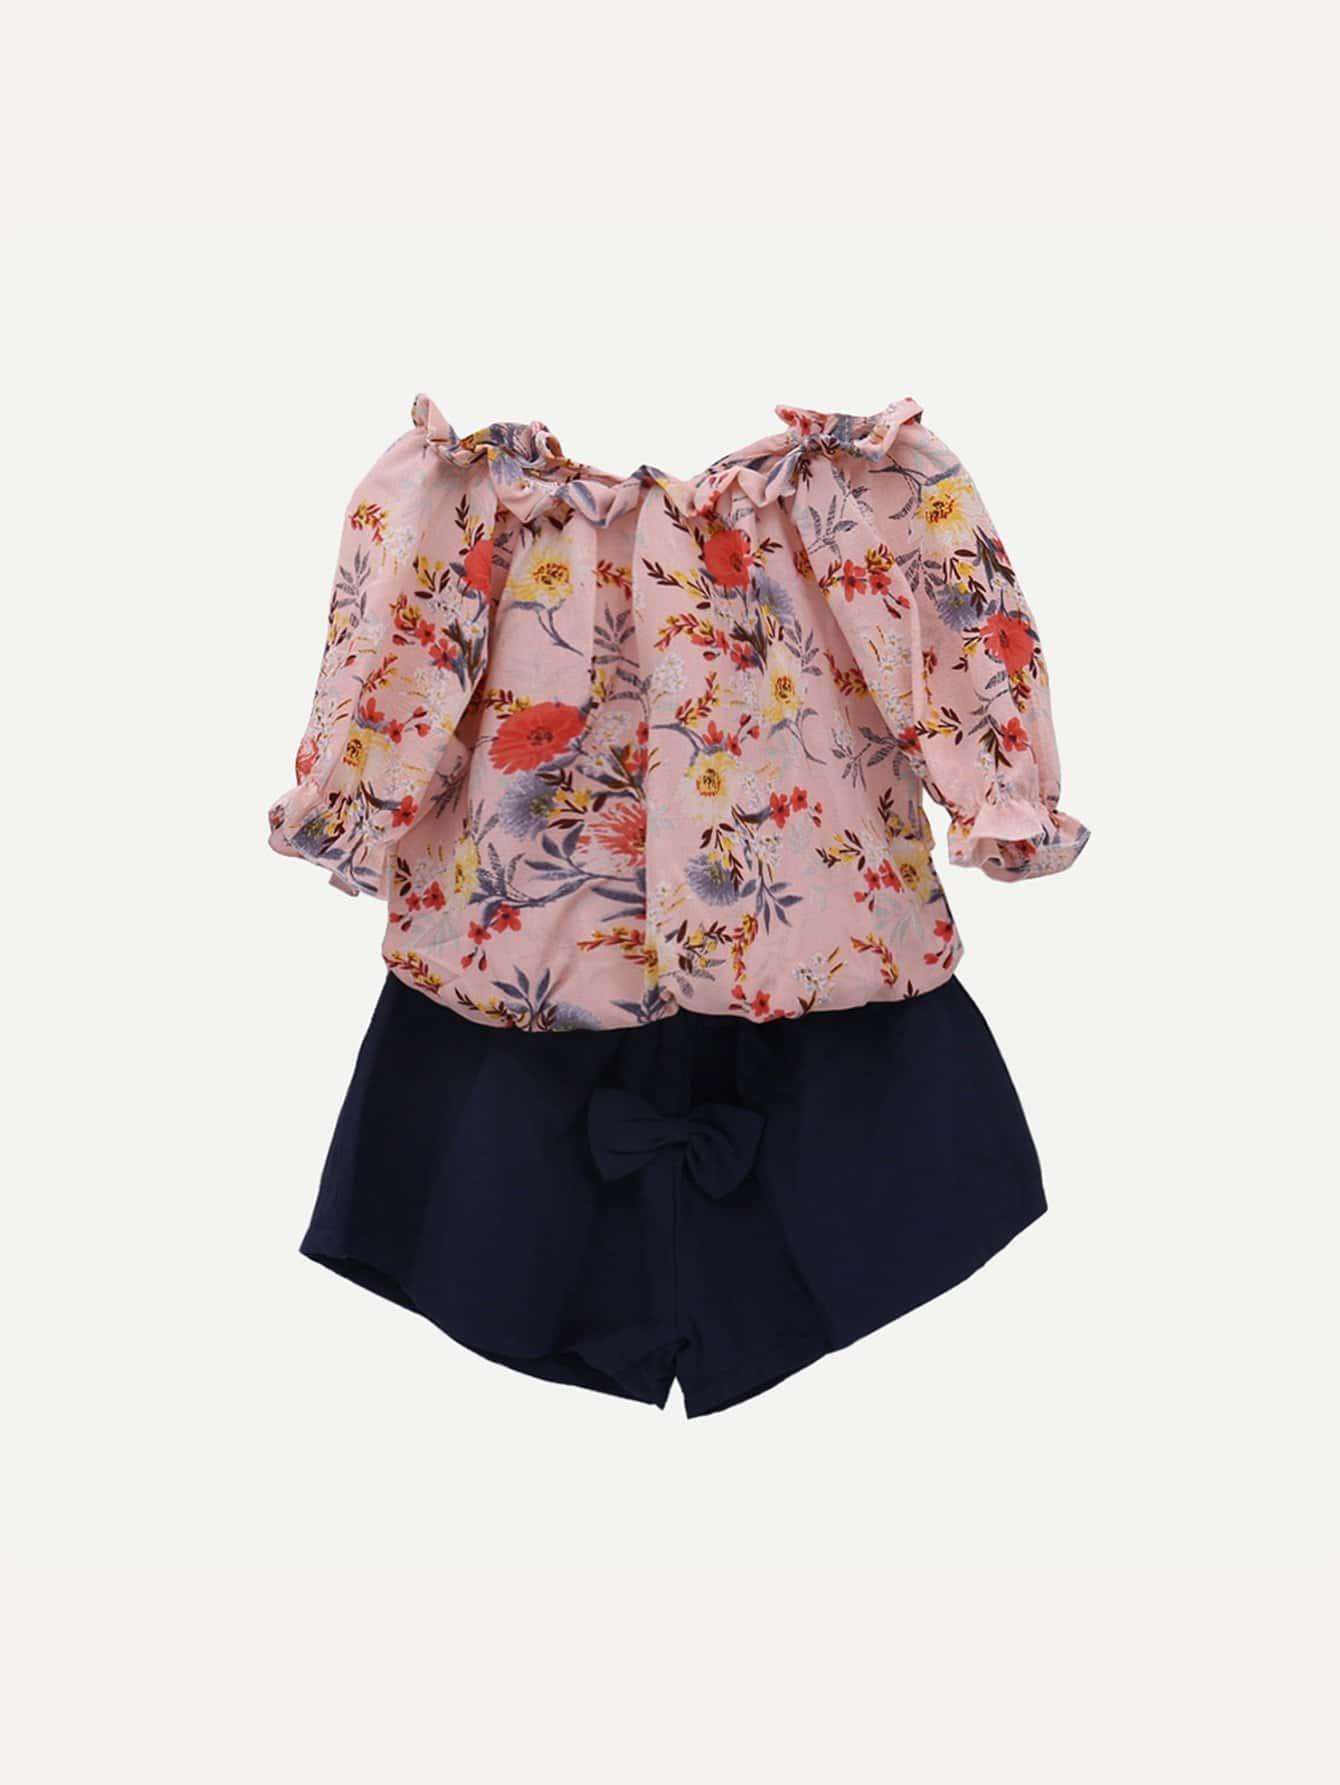 Girls Floral Print Off Shoulder Top With Shorts